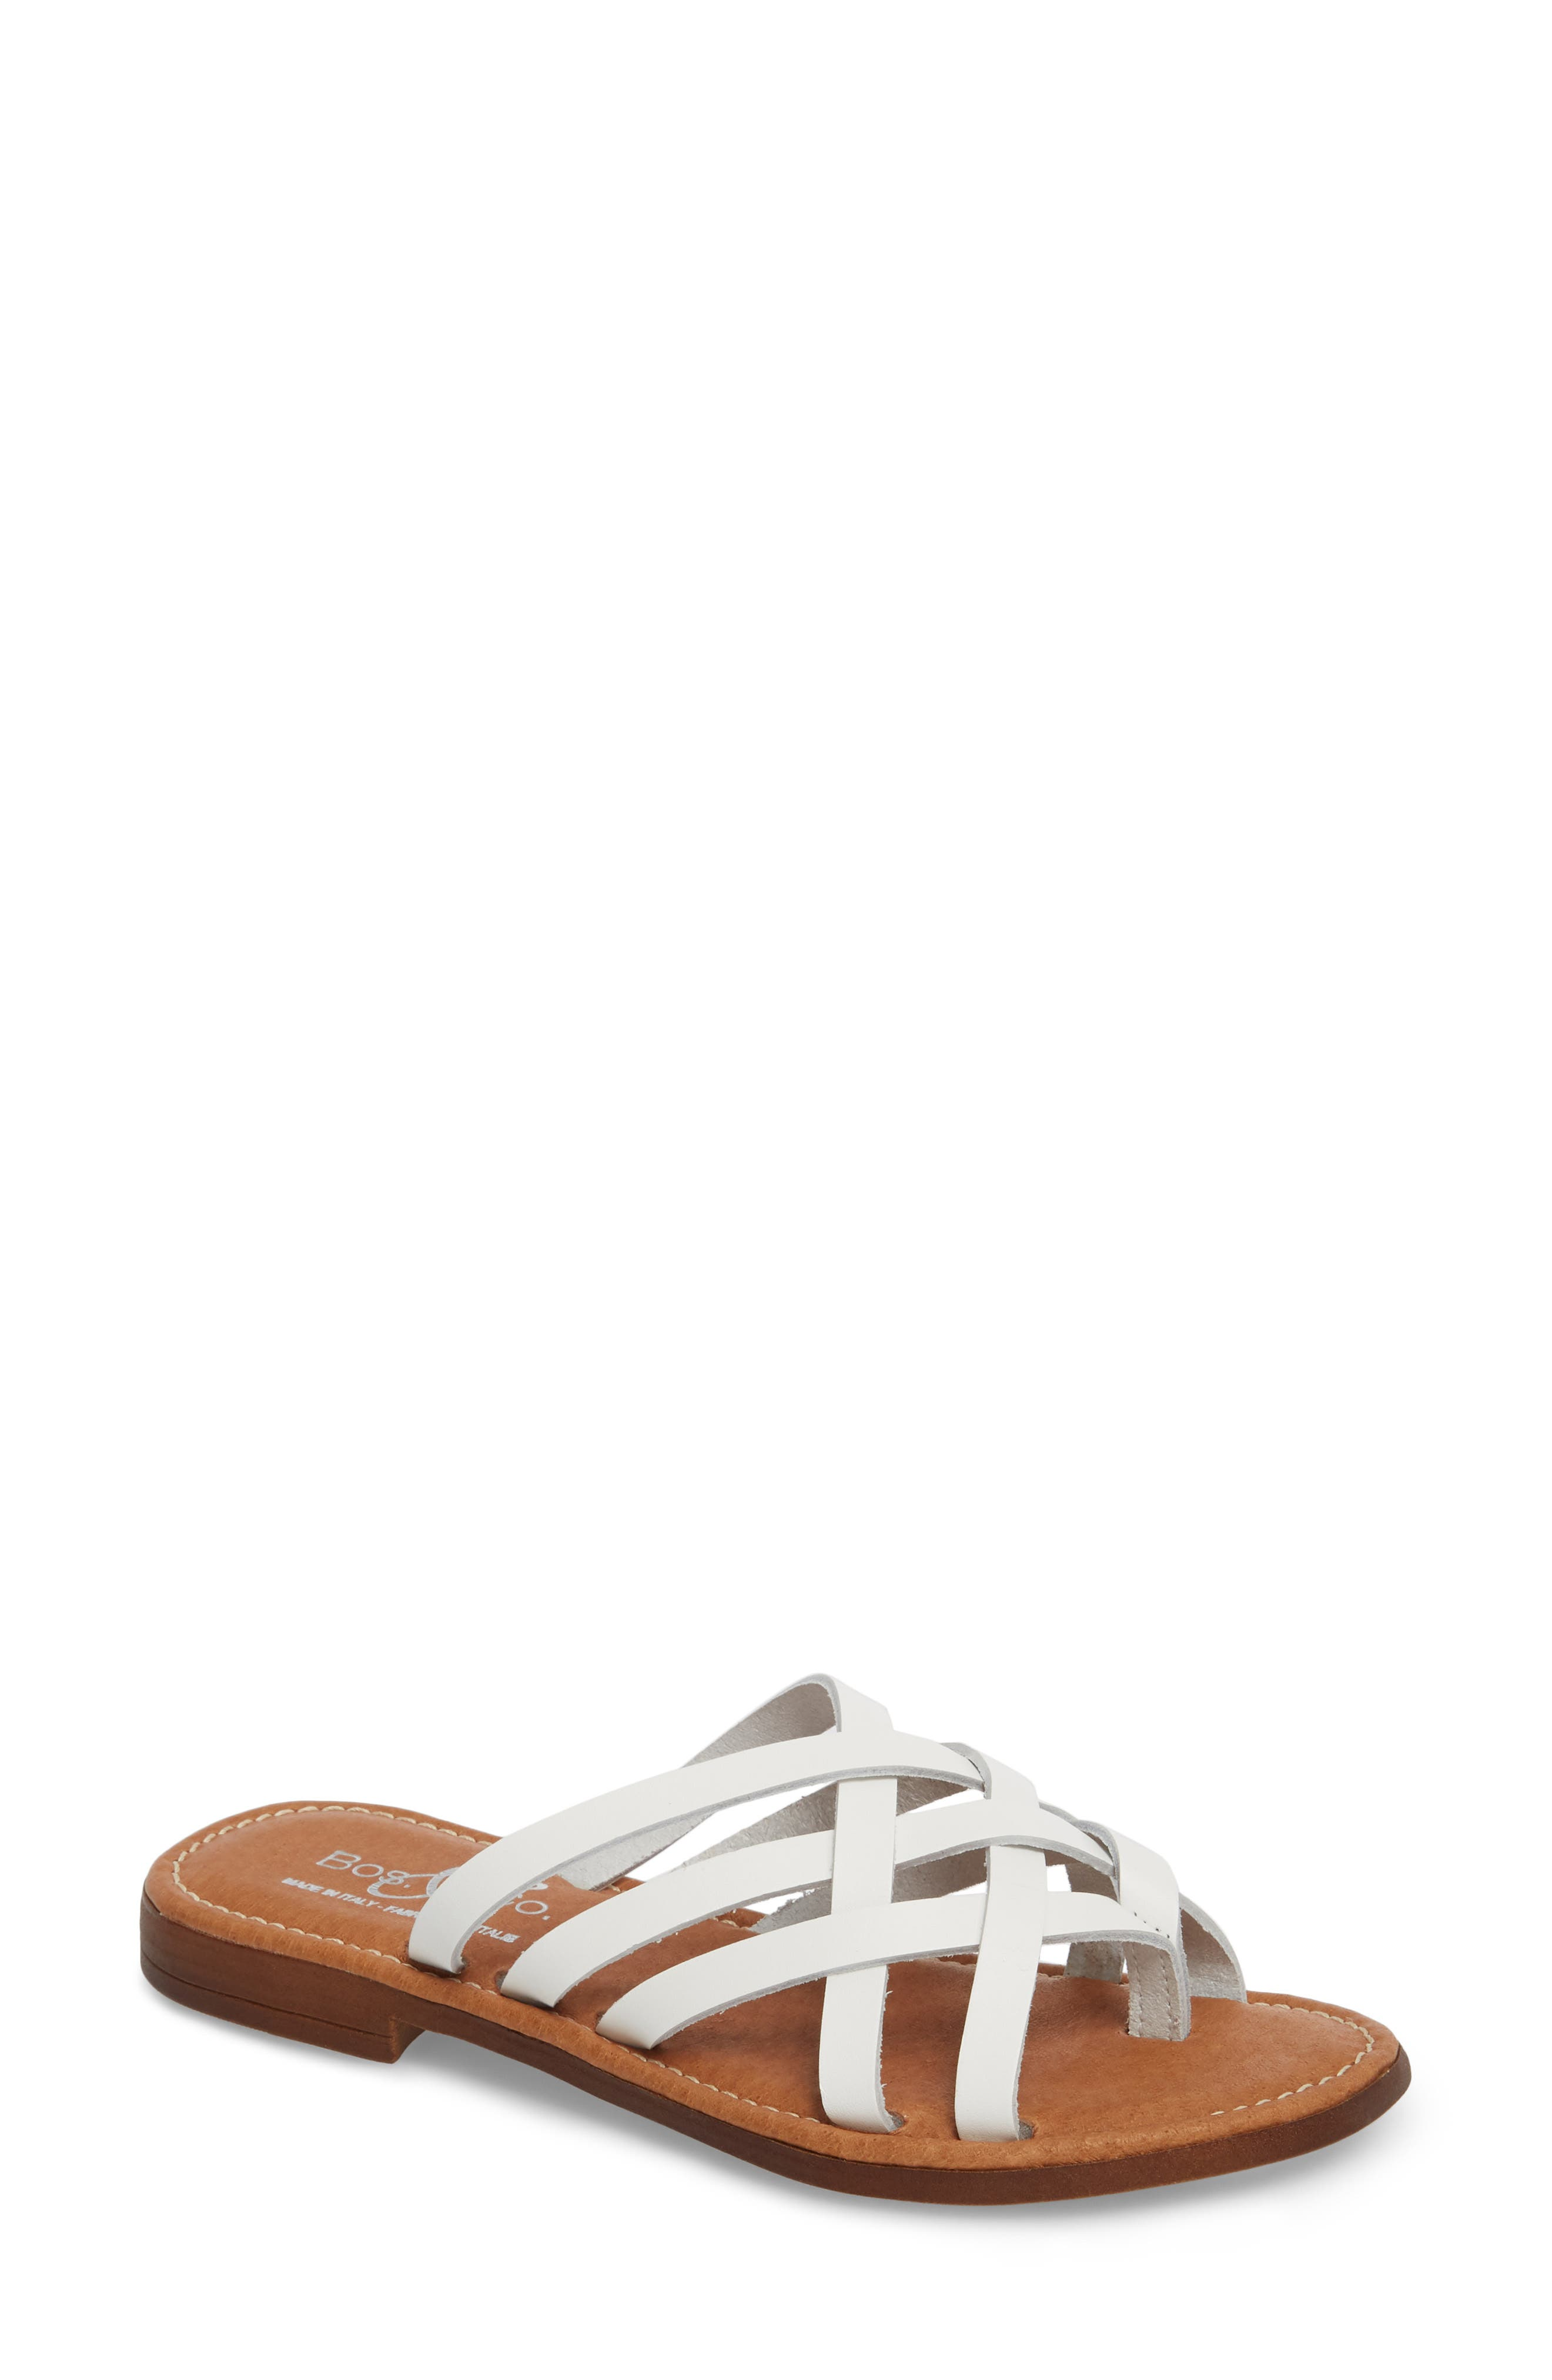 Bos. & Co. Inola Slide Sandal - White